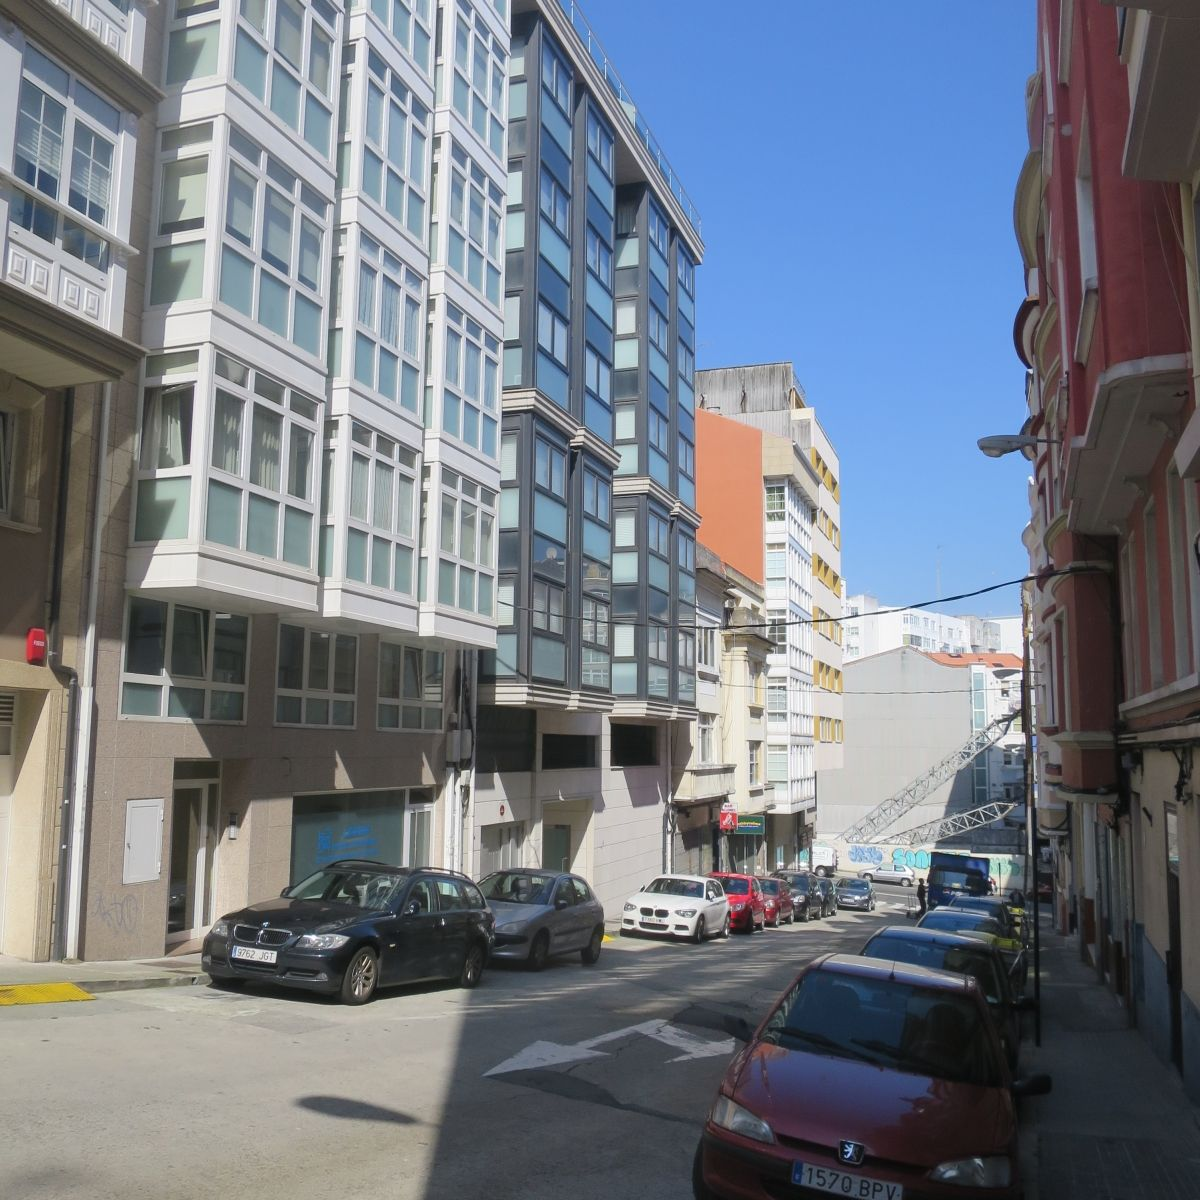 11930-avenida-eladio-rodriguez.jpg